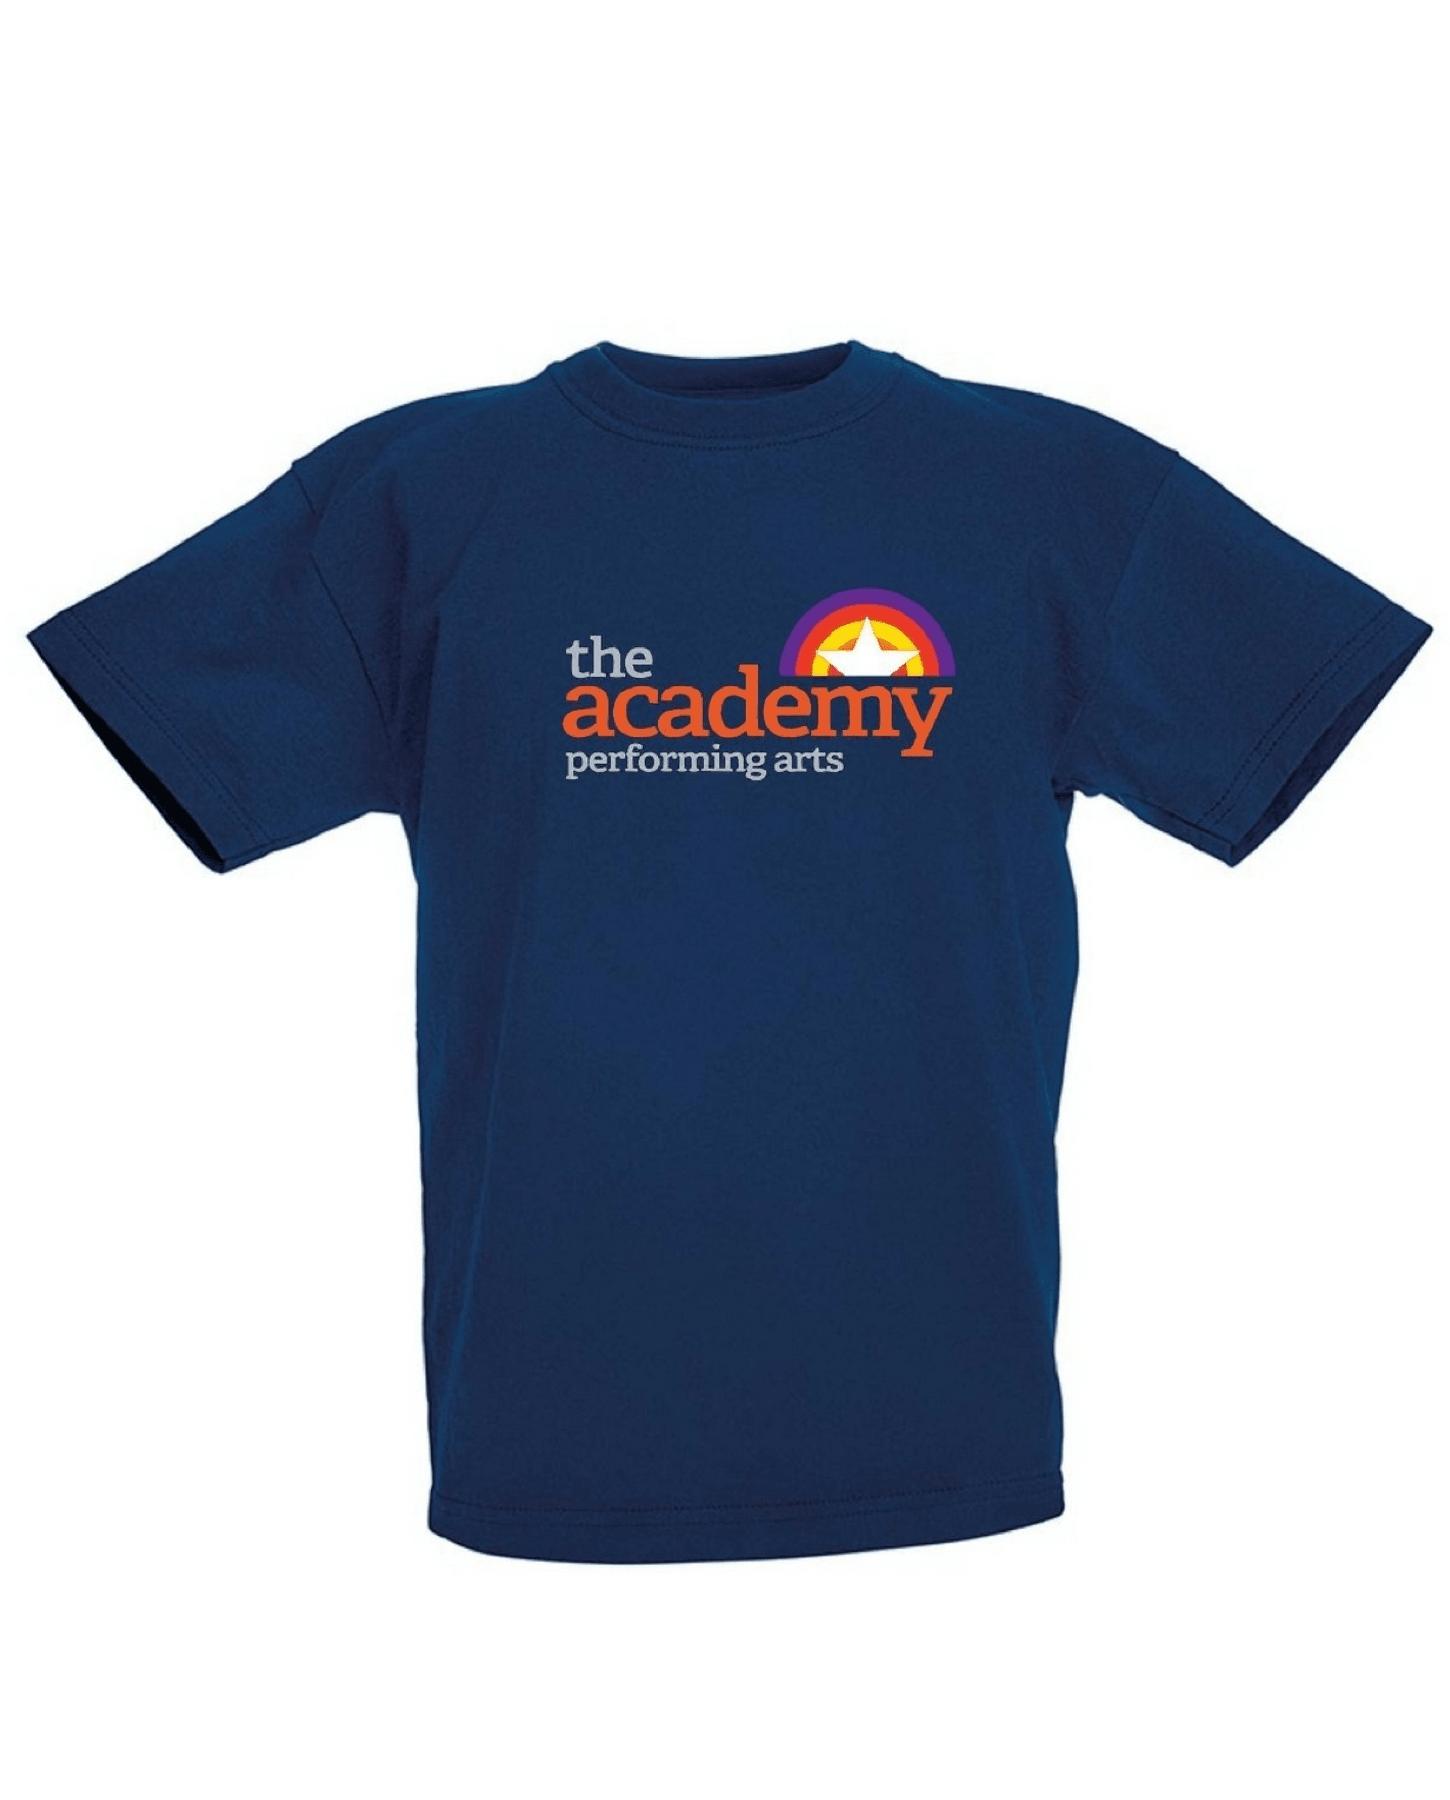 The Academy – Kids Tee